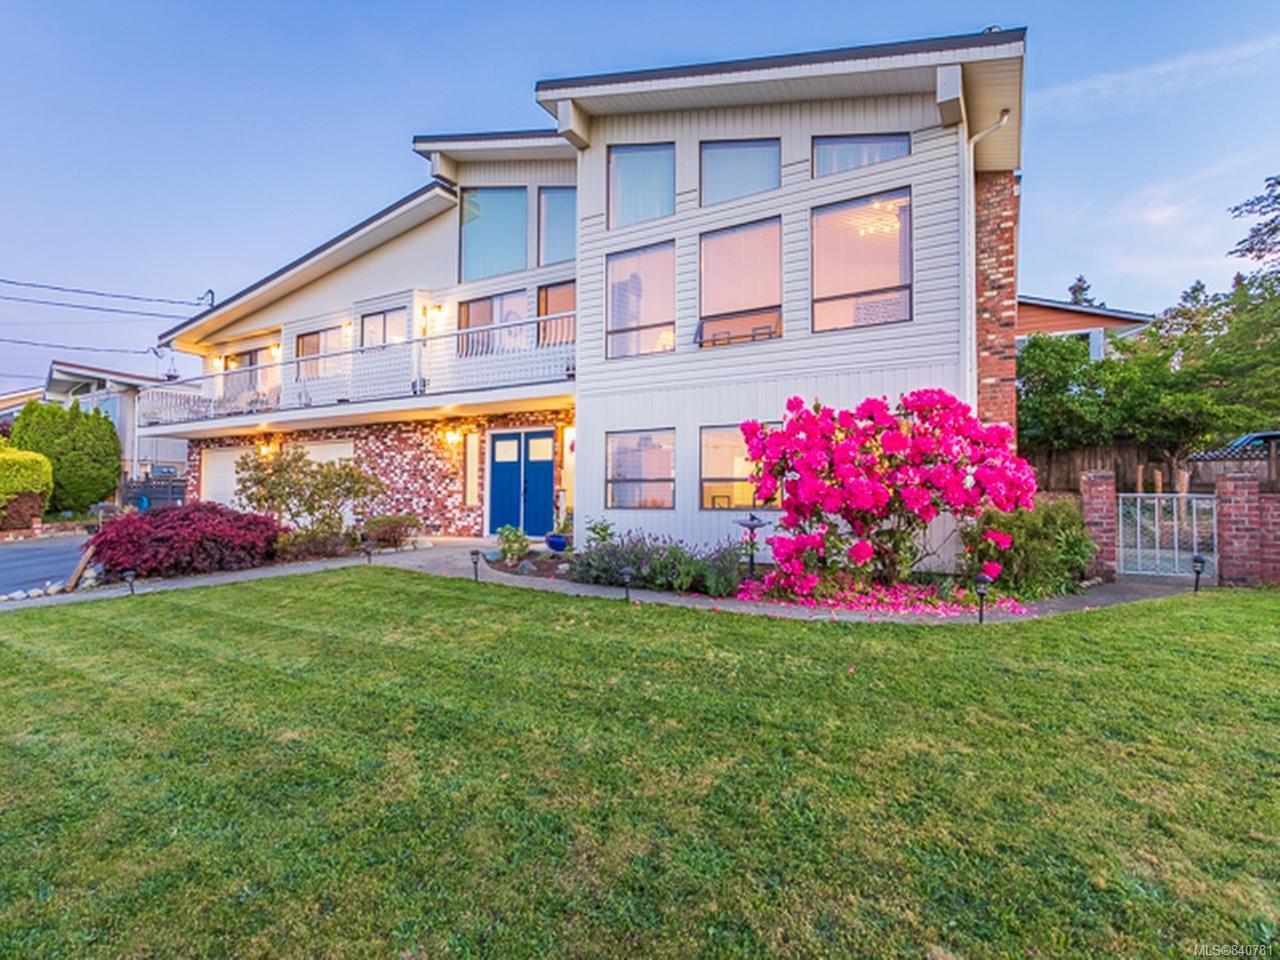 Main Photo: 2827 Cosgrove Cres in NANAIMO: Na Departure Bay Single Family Detached for sale (Nanaimo)  : MLS®# 840781